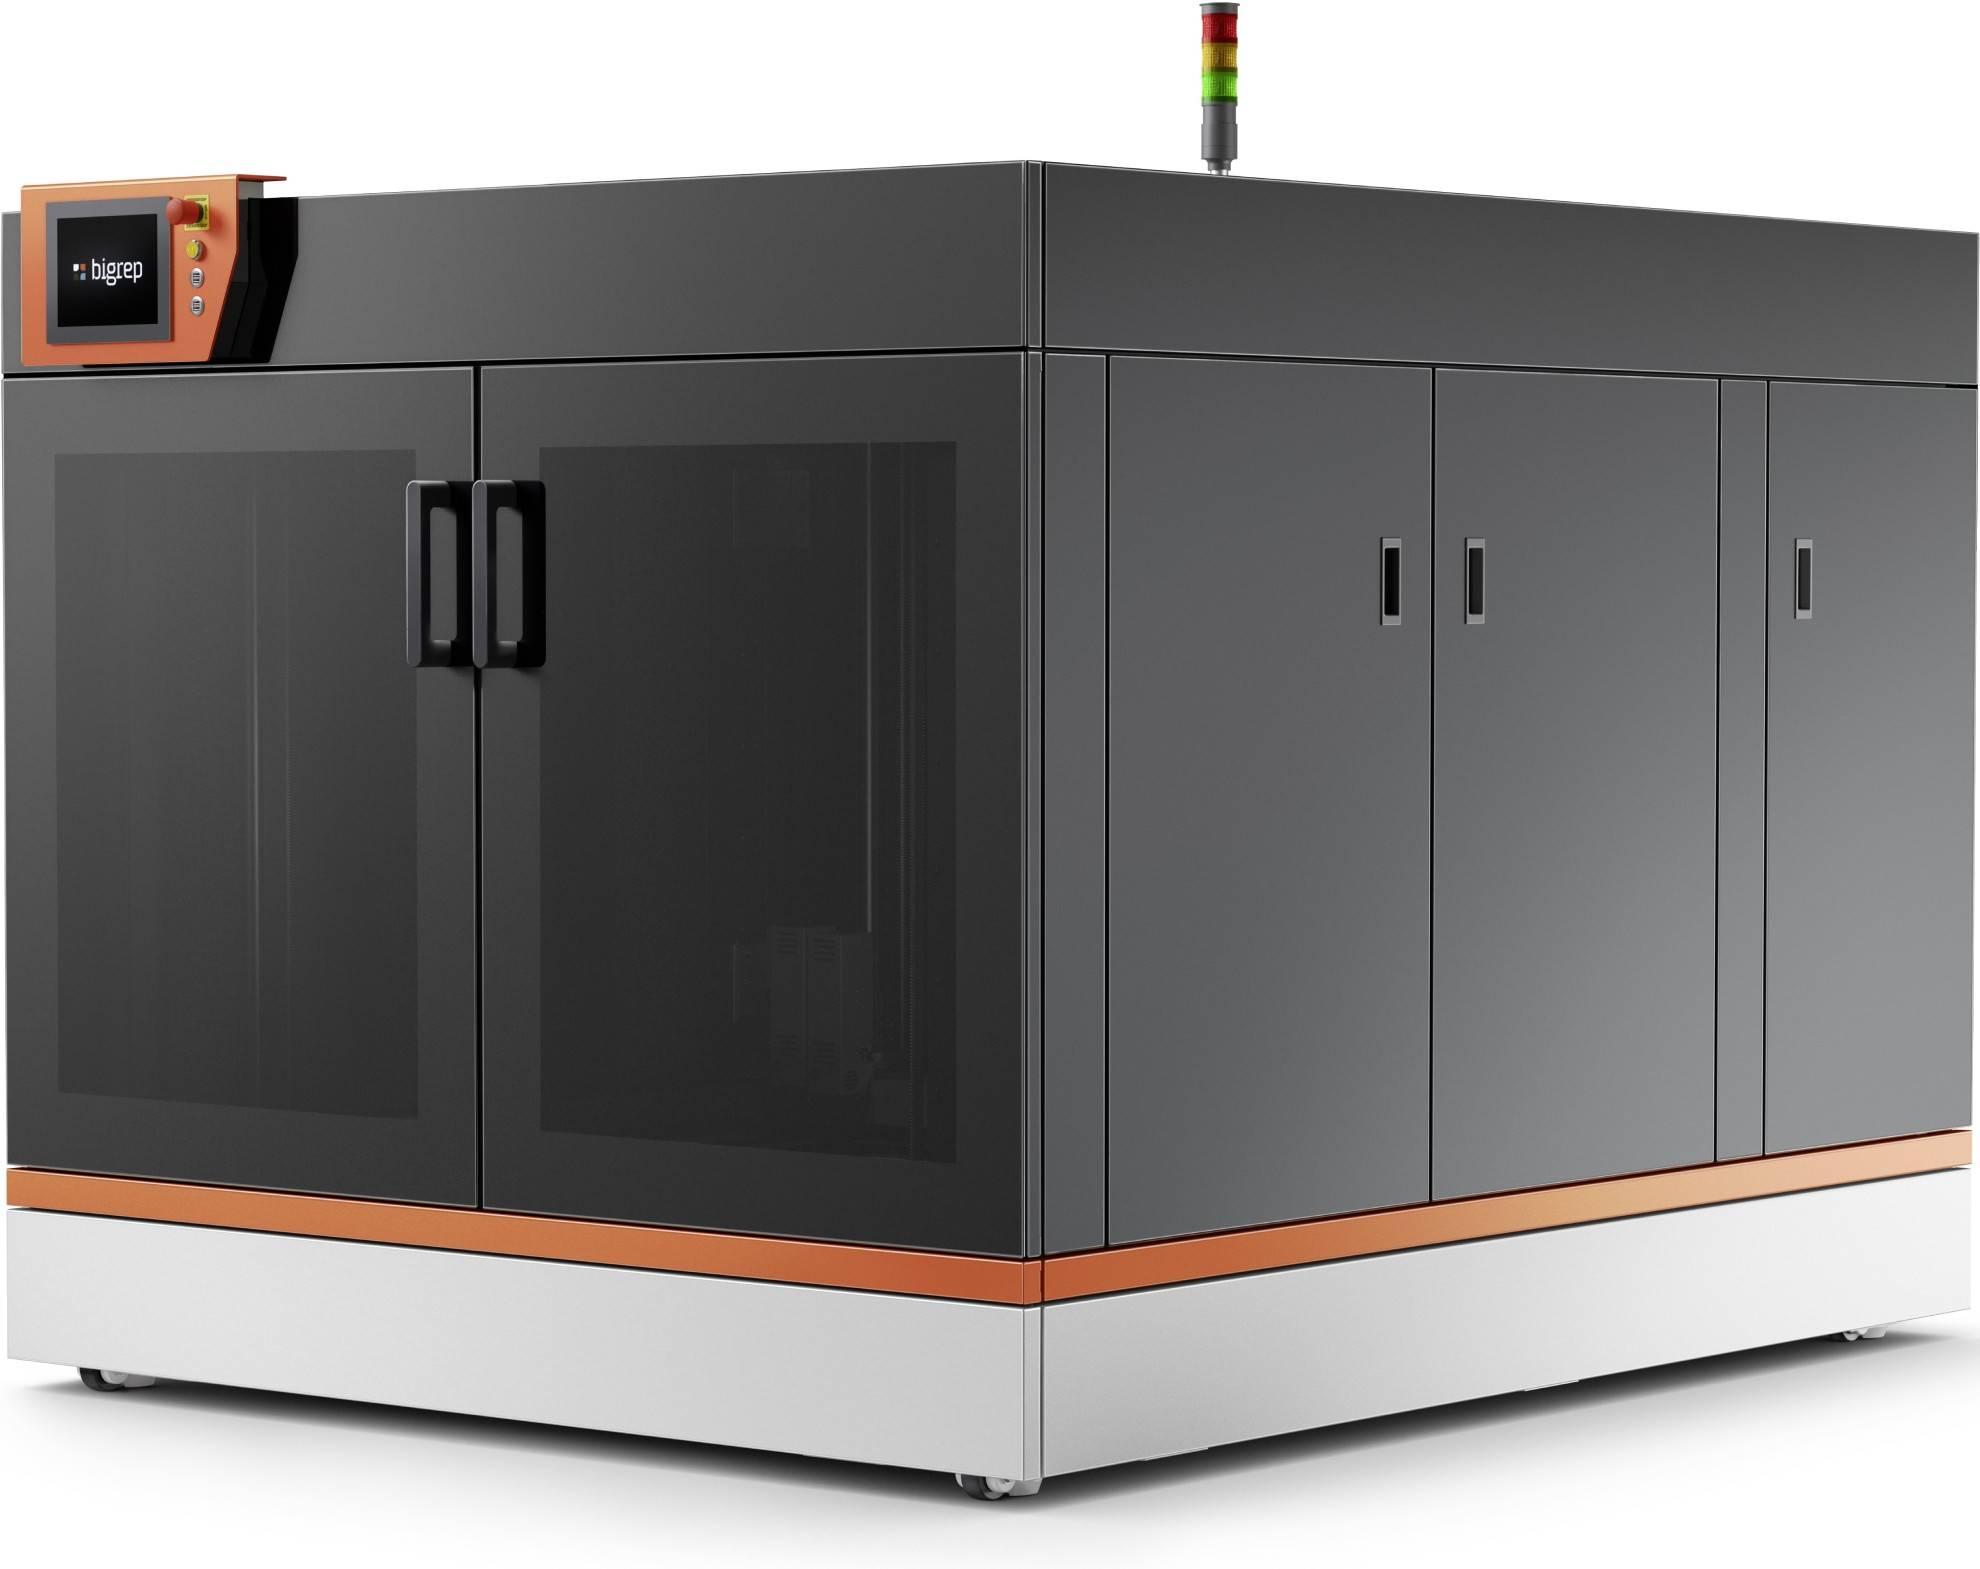 Carbon Fiber Molds from 3D Prinjter BigRep PRO